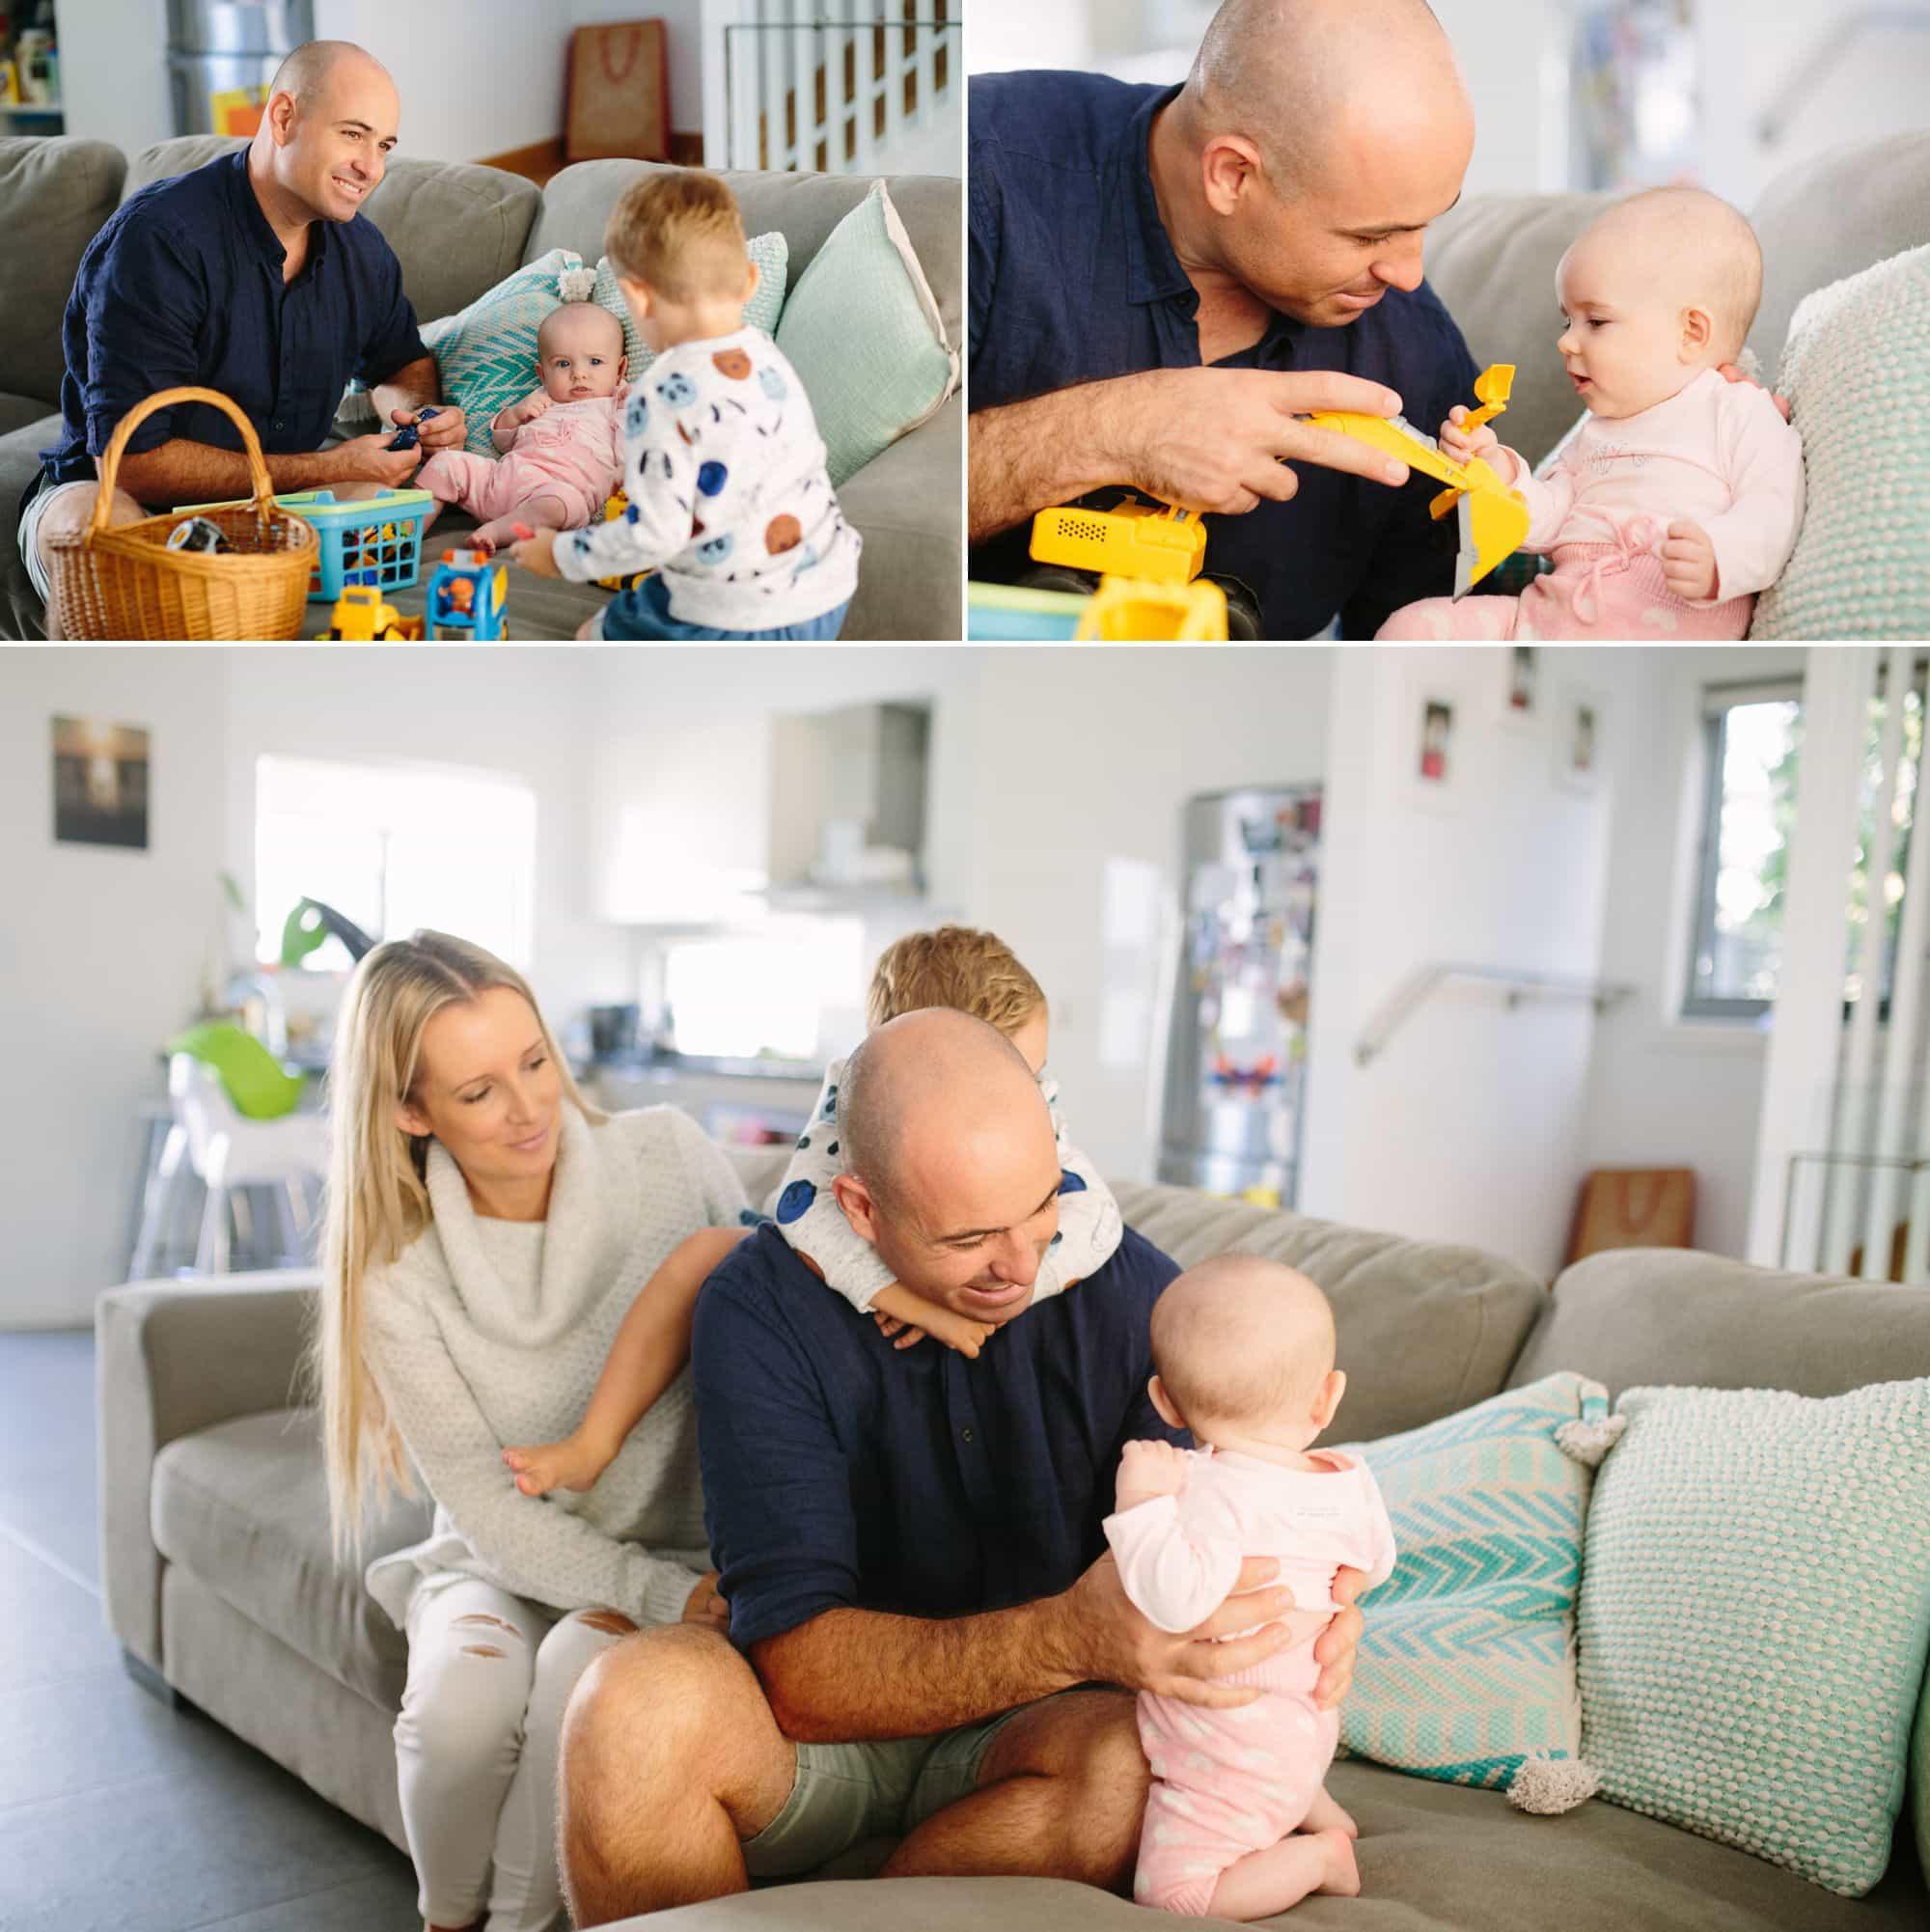 Lifestyle Family photography www.fieldandforest.com.au